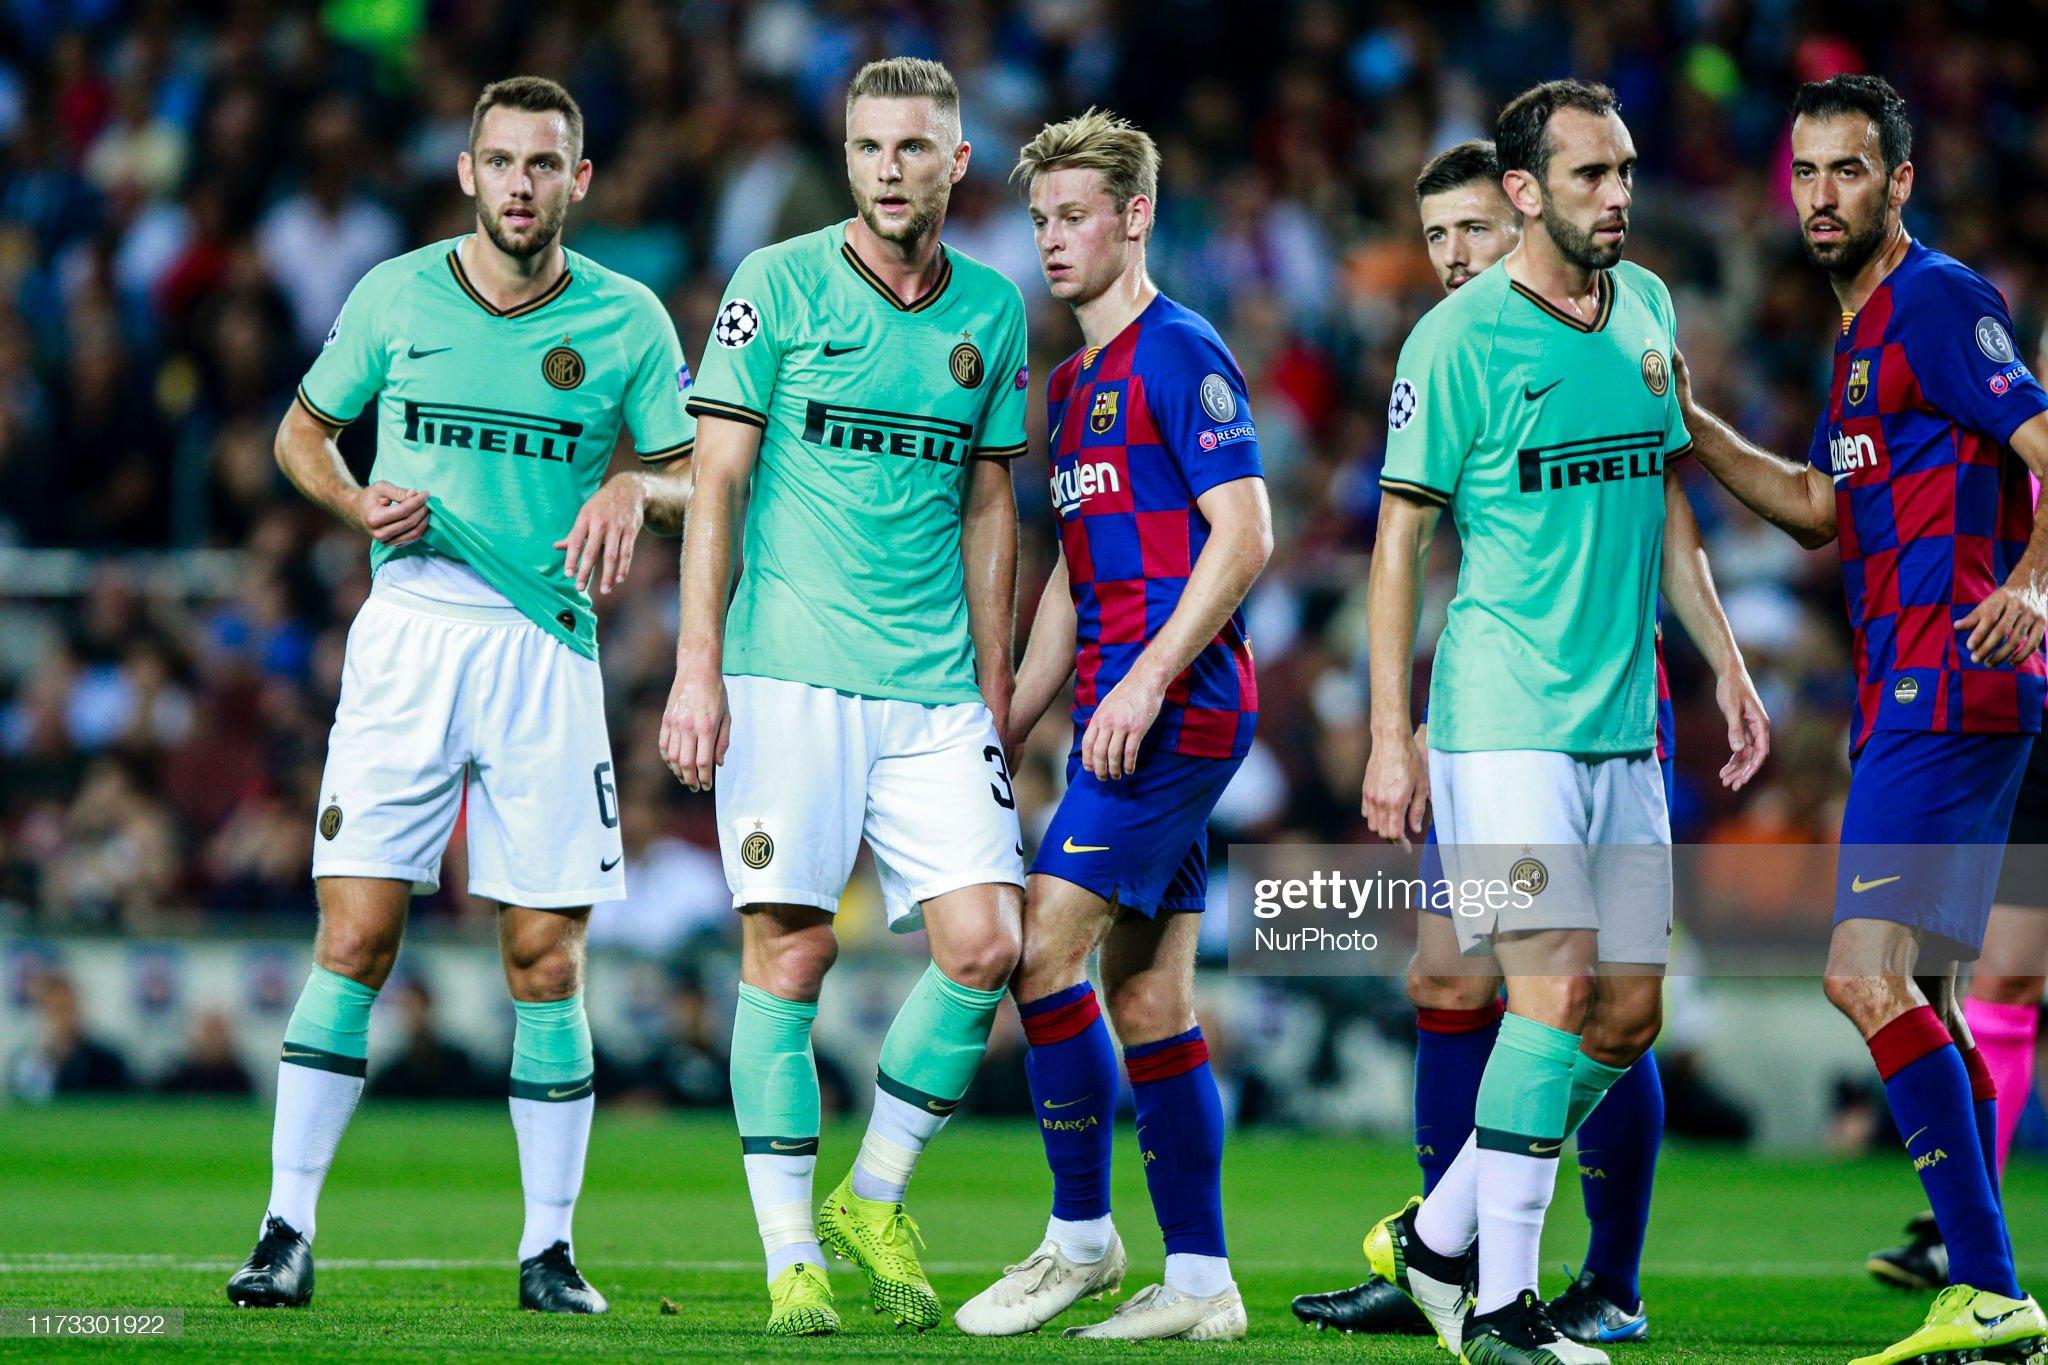 صور مباراة : برشلونة - إنتر 2-1 ( 02-10-2019 )  Action-during-the-uefa-champions-league-group-match-between-fc-and-picture-id1173301922?s=2048x2048